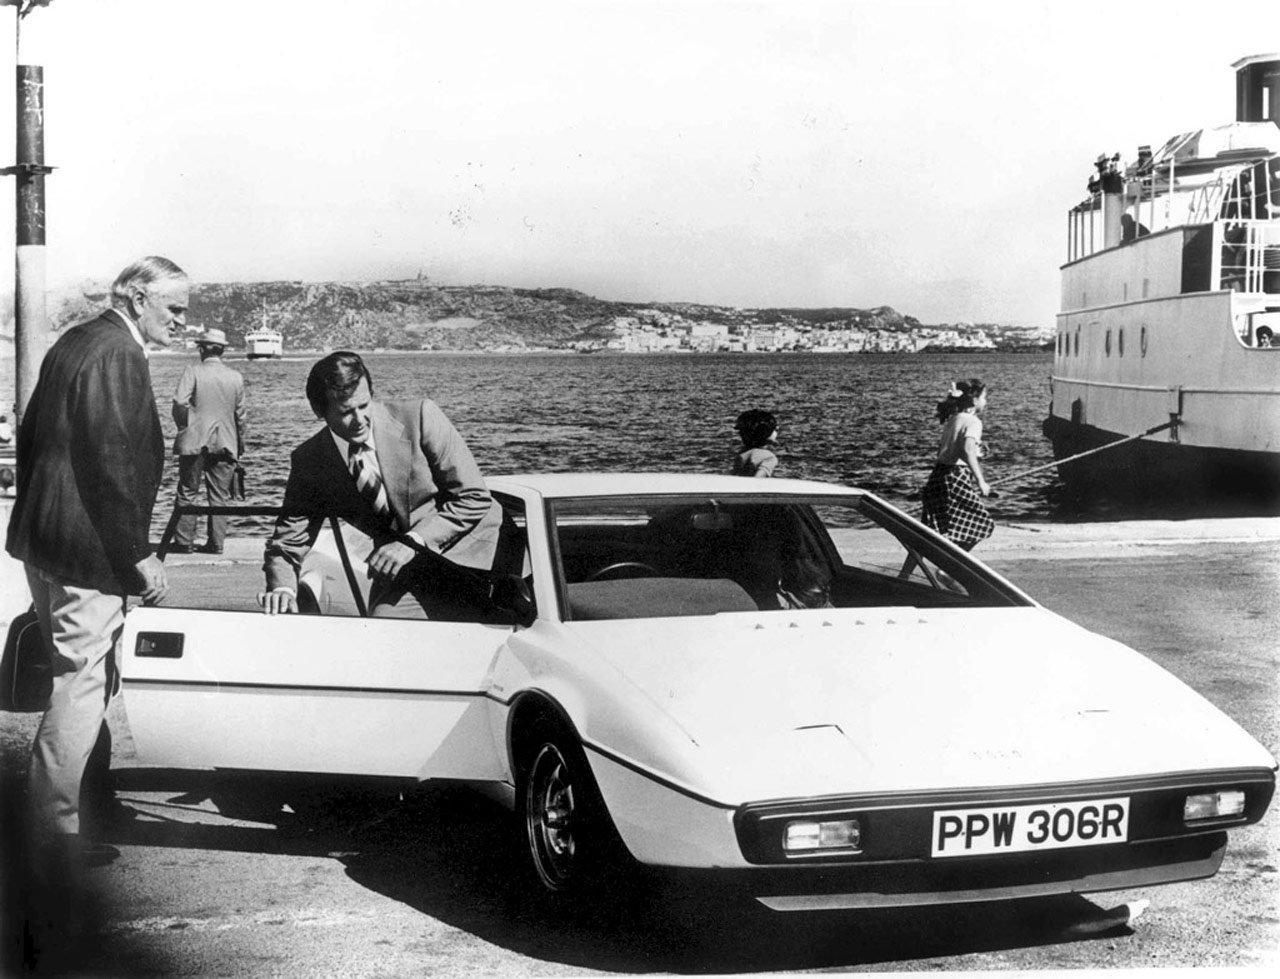 James Bond's Lotus Esprit S1